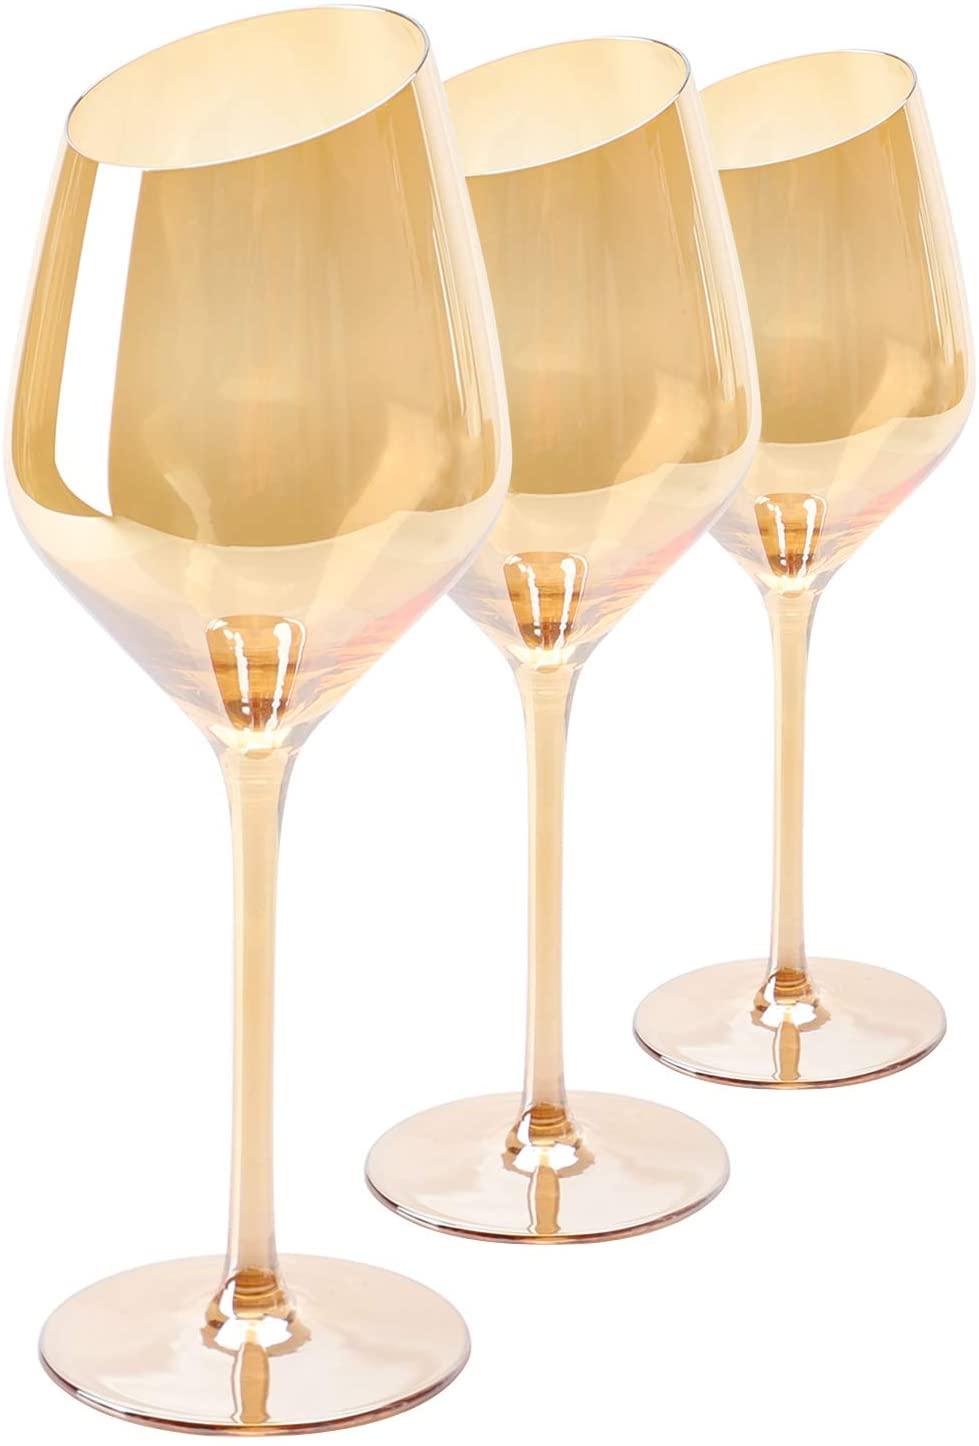 Crystal Wine Glass, Beasea 10 oz Set of 3 Red Wine Glasses Long Stem Wine Glasses Hand Blown White Wine Glasses for Wedding Anniversary - Amber